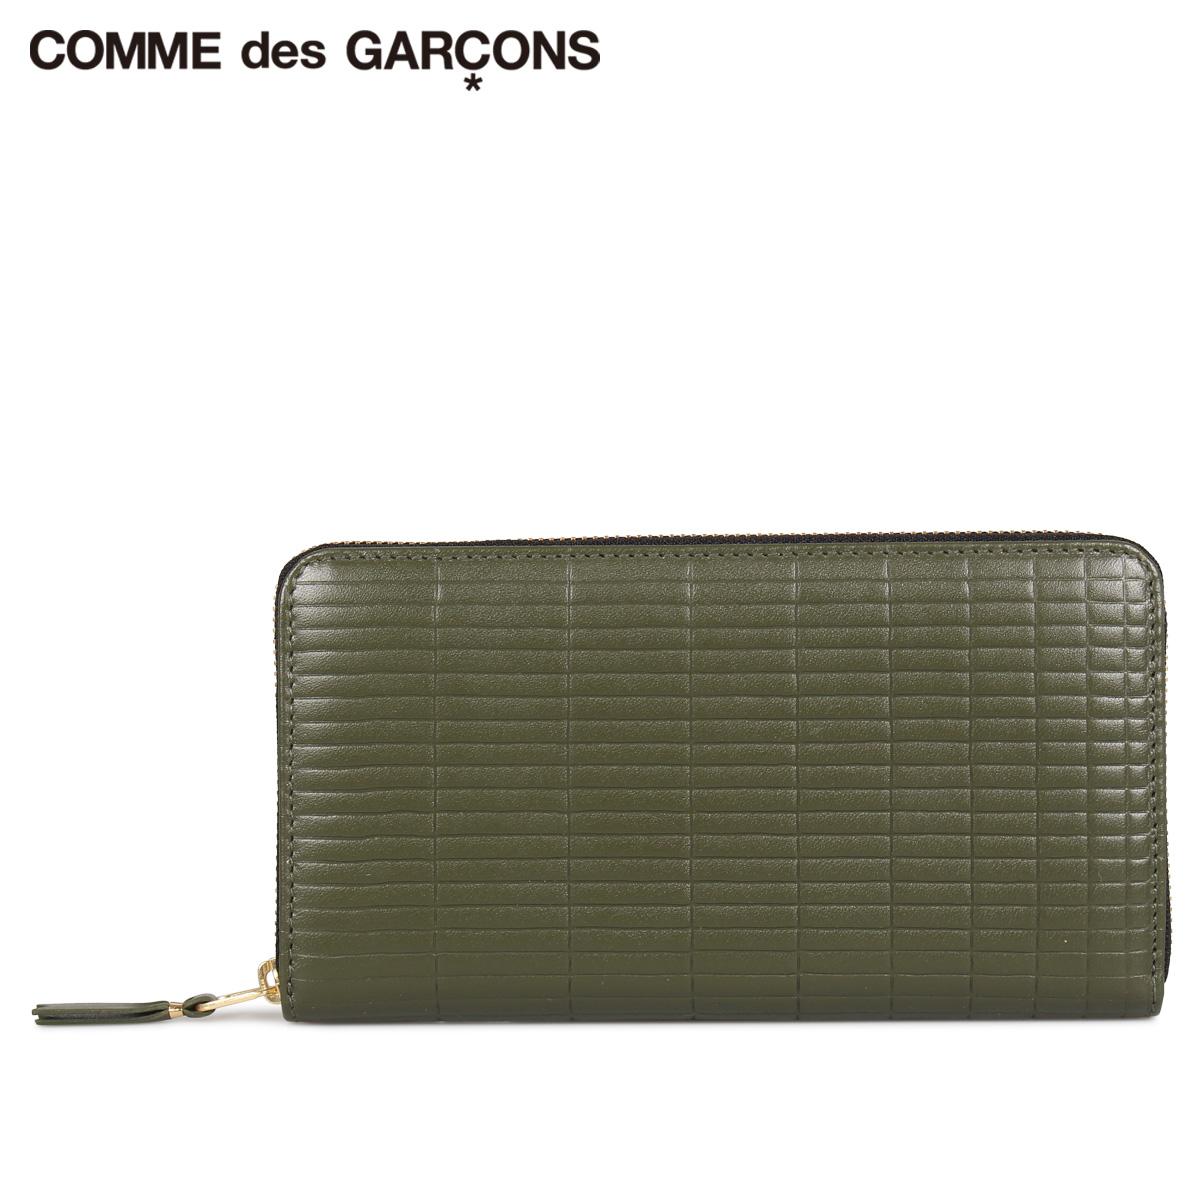 COMME des GARCONS コムデギャルソン 財布 長財布 メンズ レディース ラウンドファスナー BRICK WALLET カーキ SA0111BK